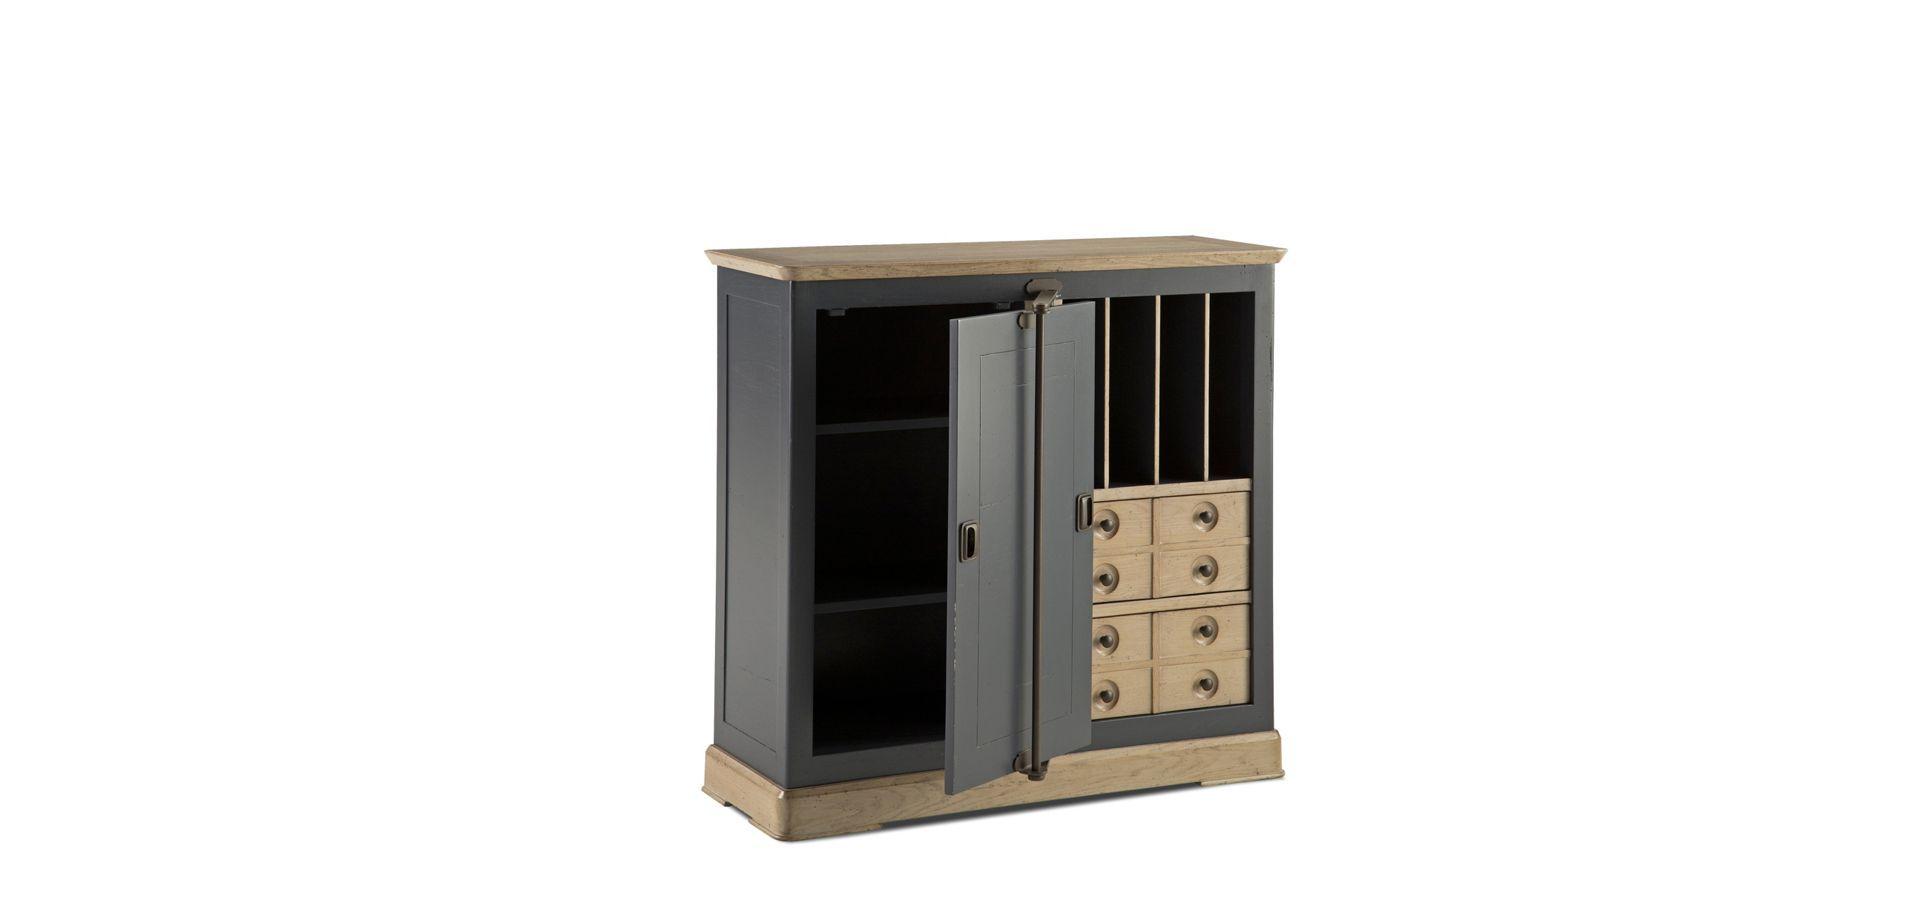 Armand Meuble D Entree Roche Bobois Locker Storage Adjustable Shelving Storage